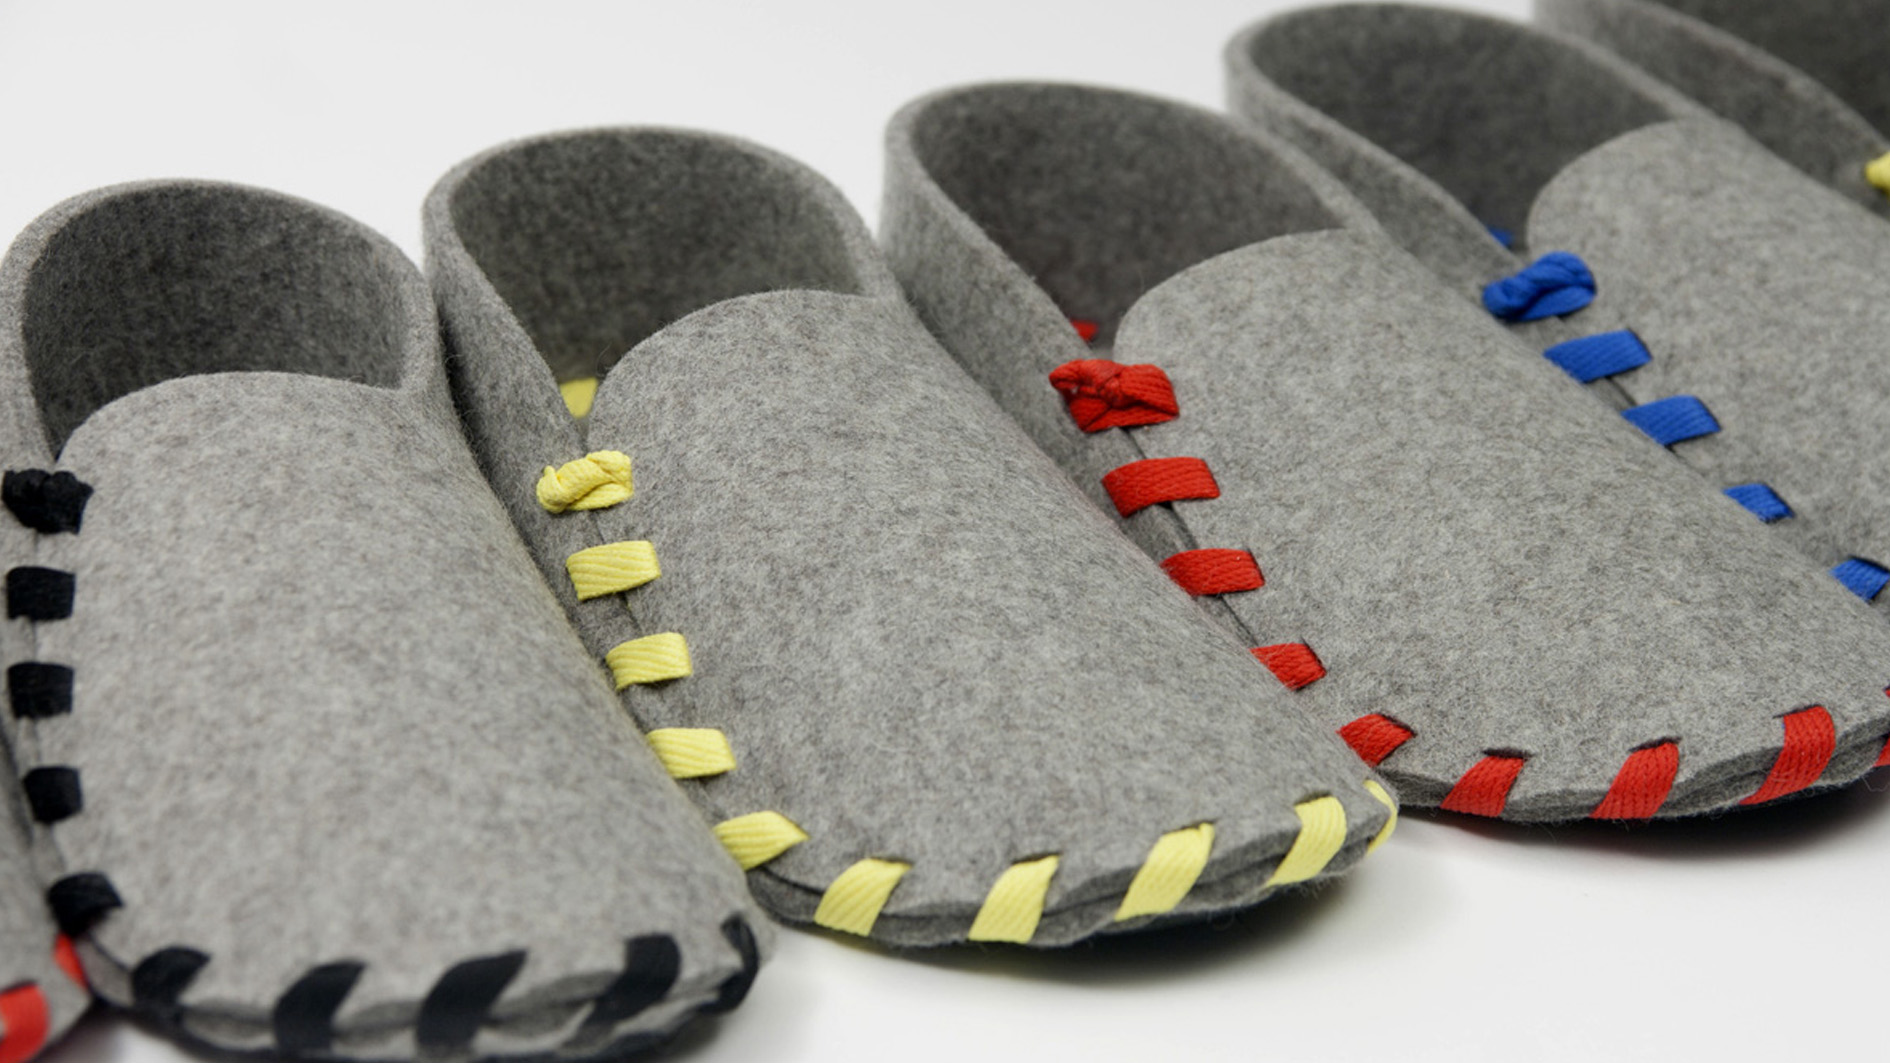 sewingpatternscomnew